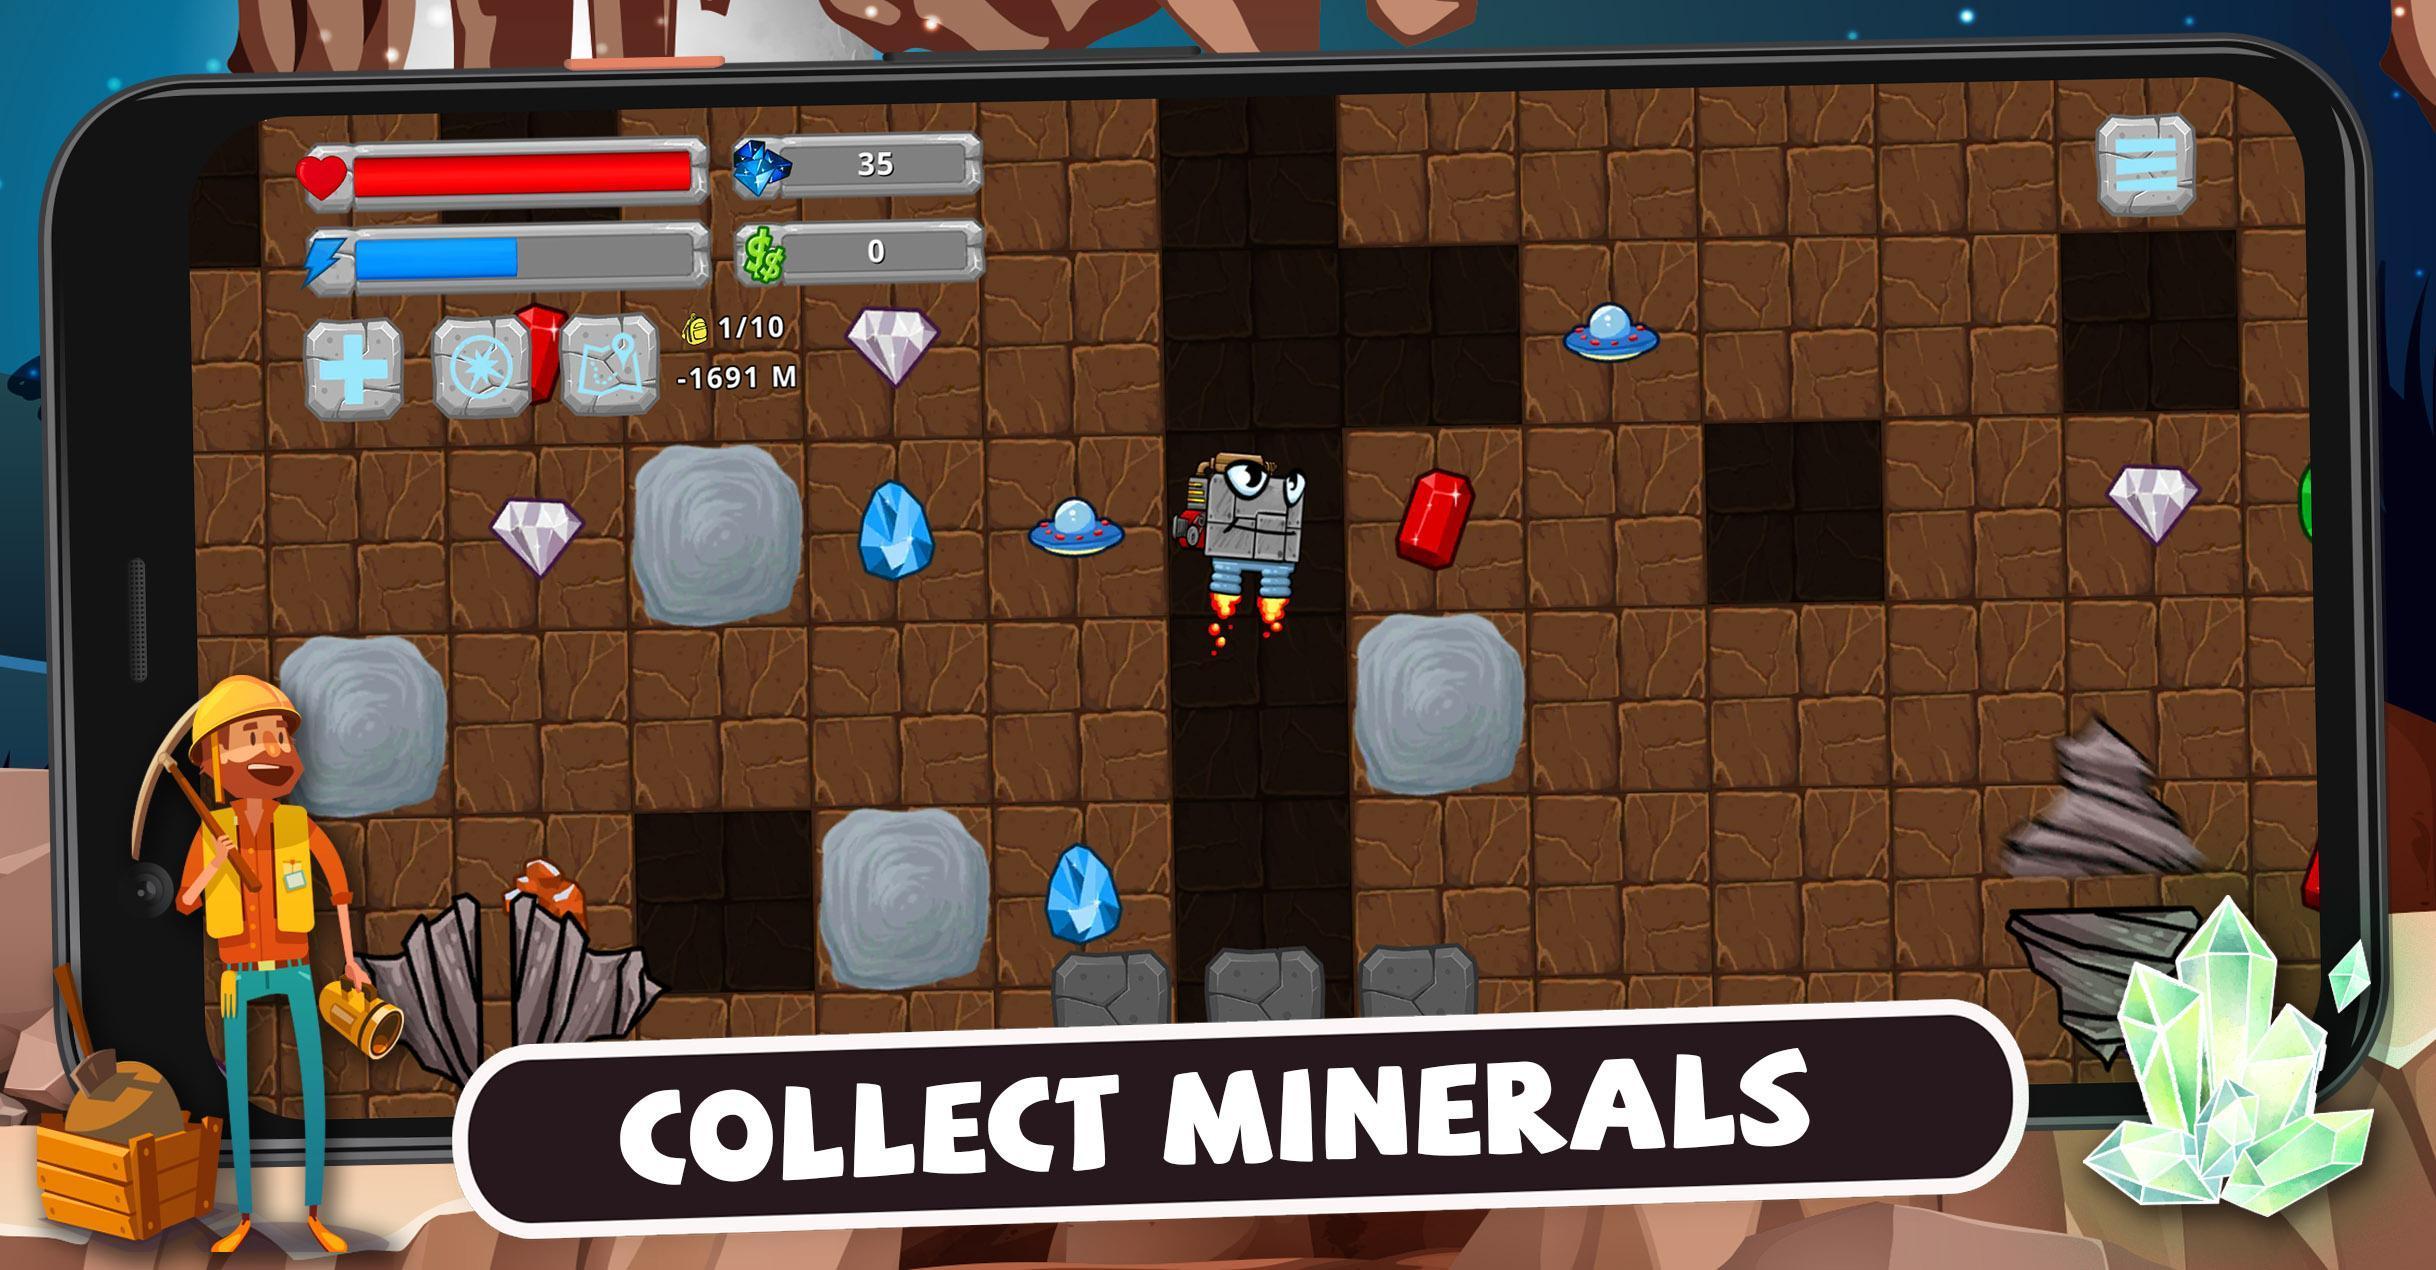 Digger Machine dig and find minerals 2.7.0 Screenshot 1